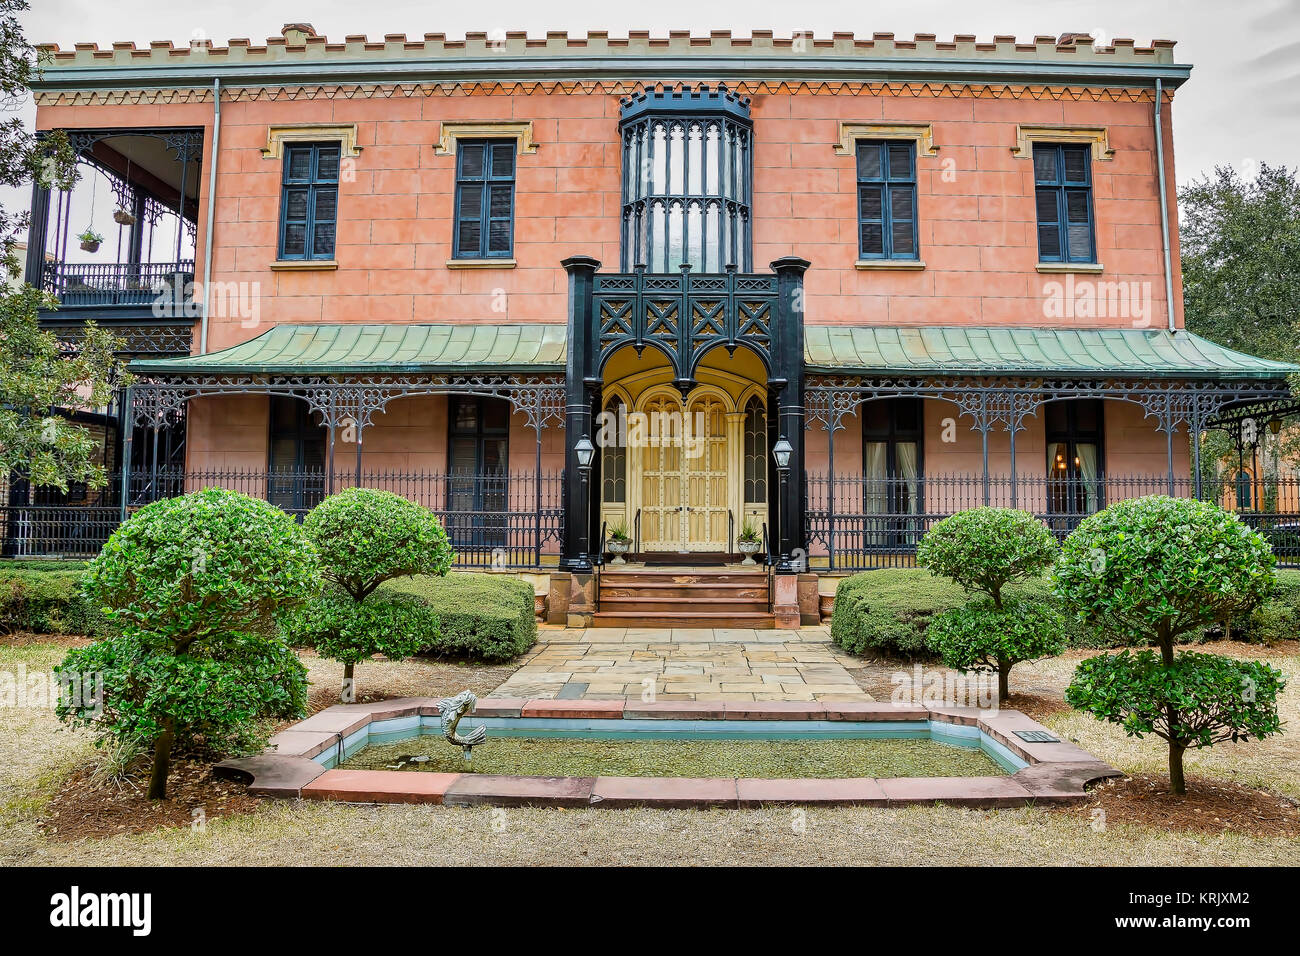 The Green Meldrim House in Savannah, Georgia - Stock Image